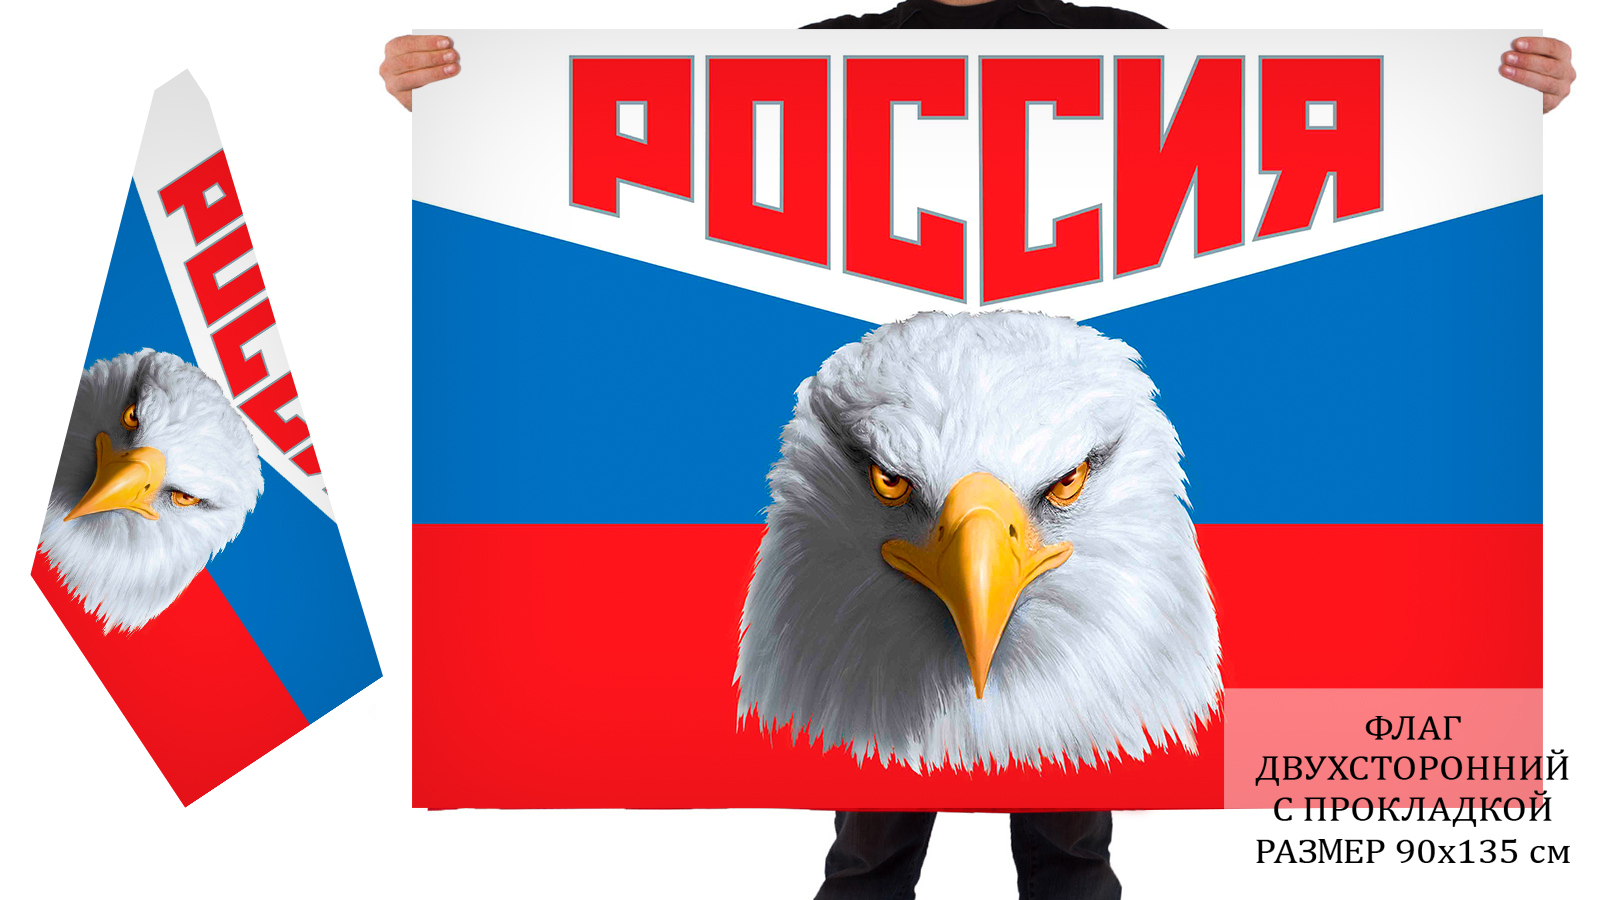 Двусторонний флаг Российской Федерации с орлом